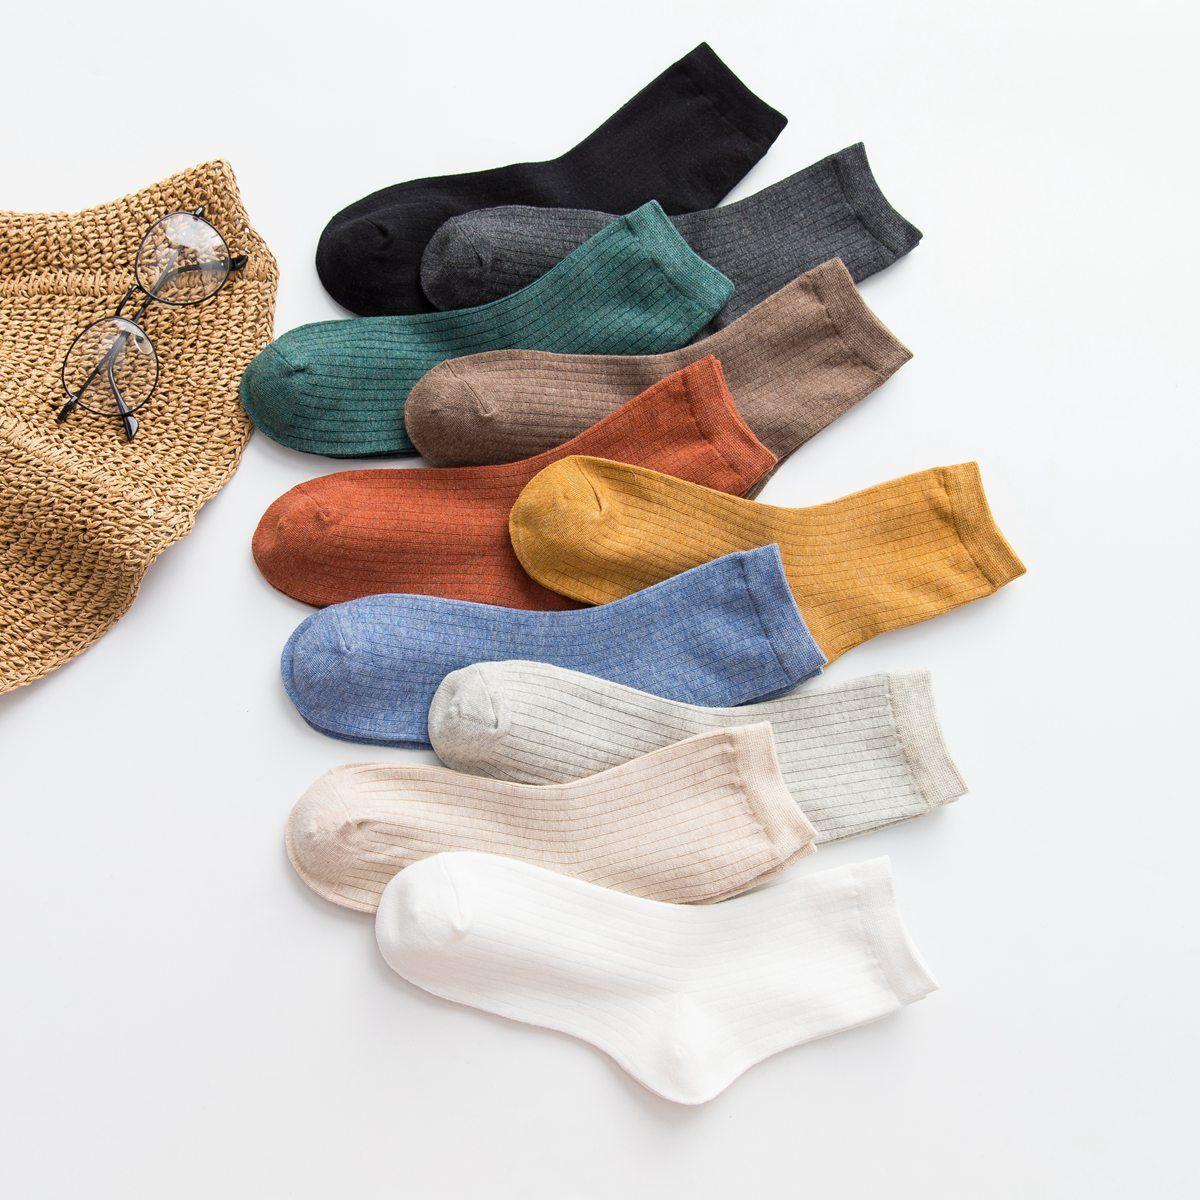 Cotton female tube socks pure color brand double-needle <font><b>Japanese</b></font> female socks cotton manufacturers socks wholesale a generation